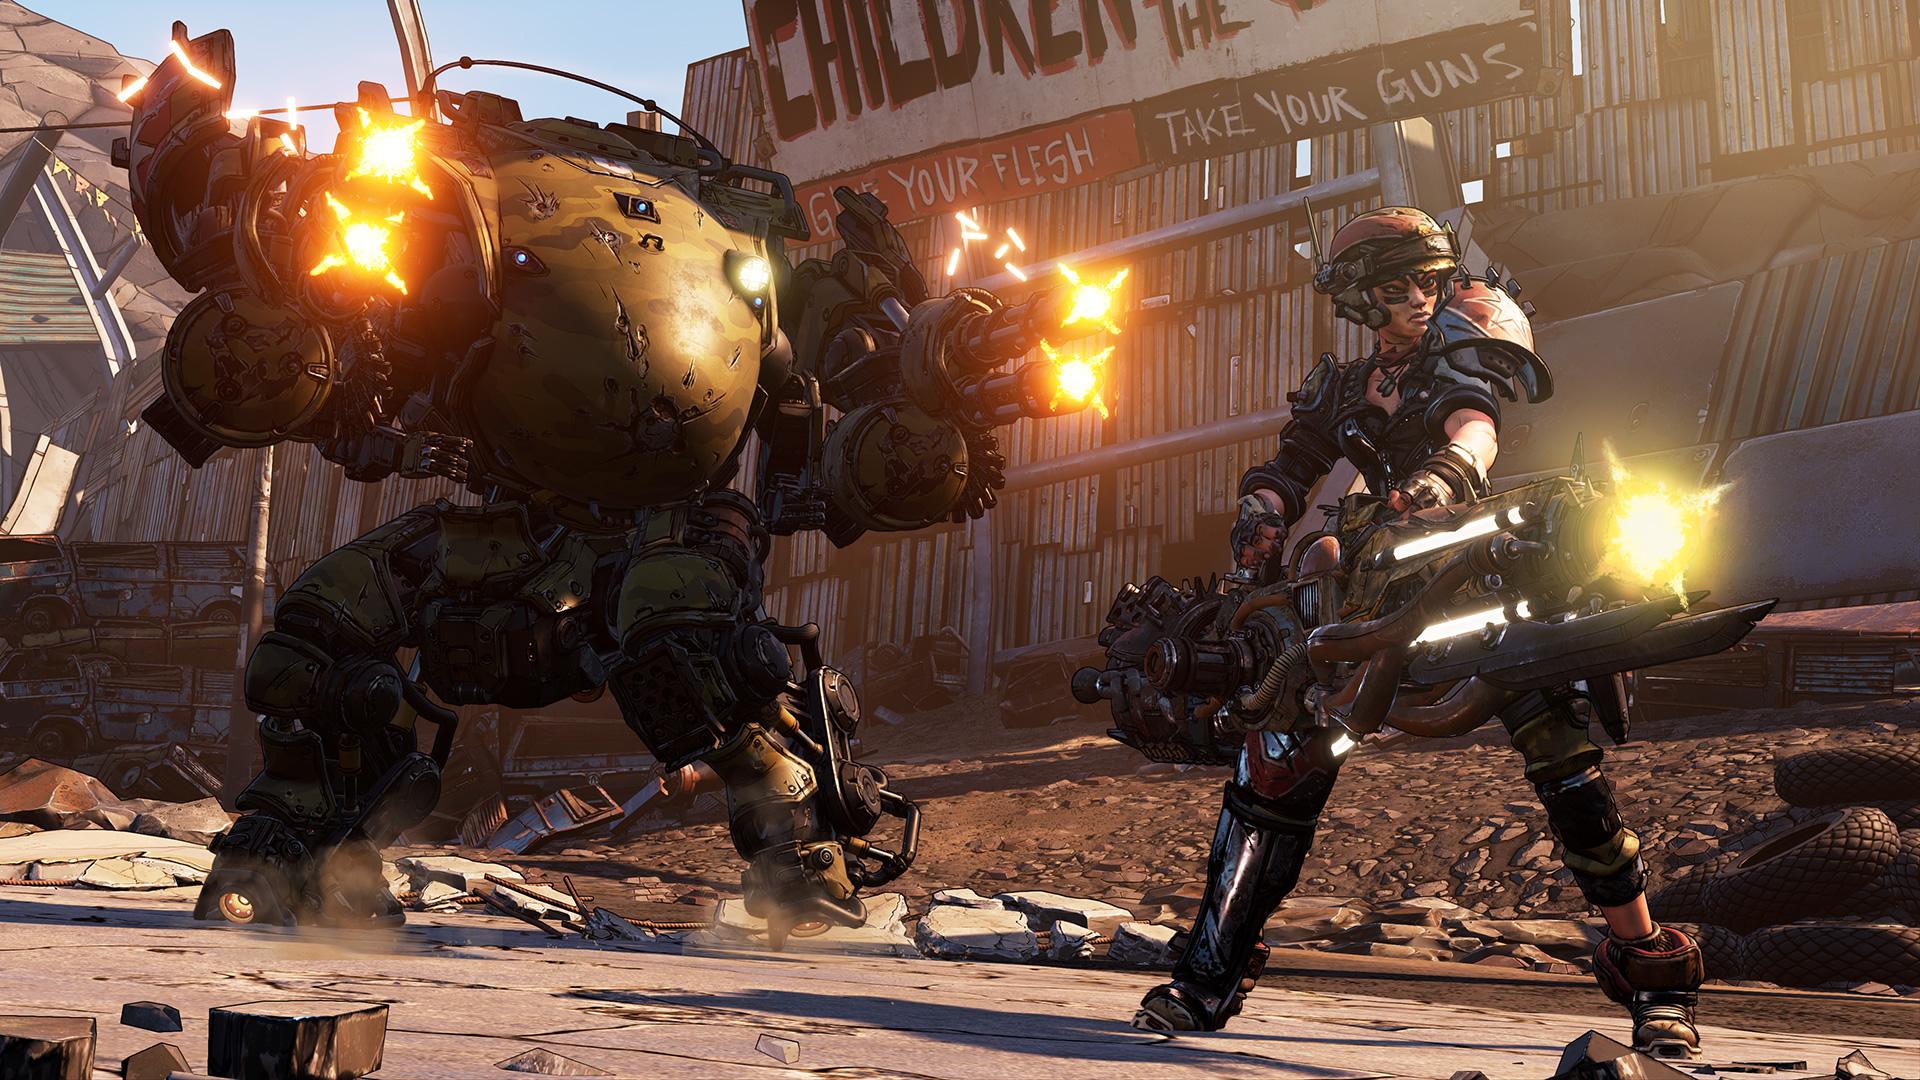 Borderlands 3 Screenshot - September 2019 Gaming Releases|Gears 5 Screenshot